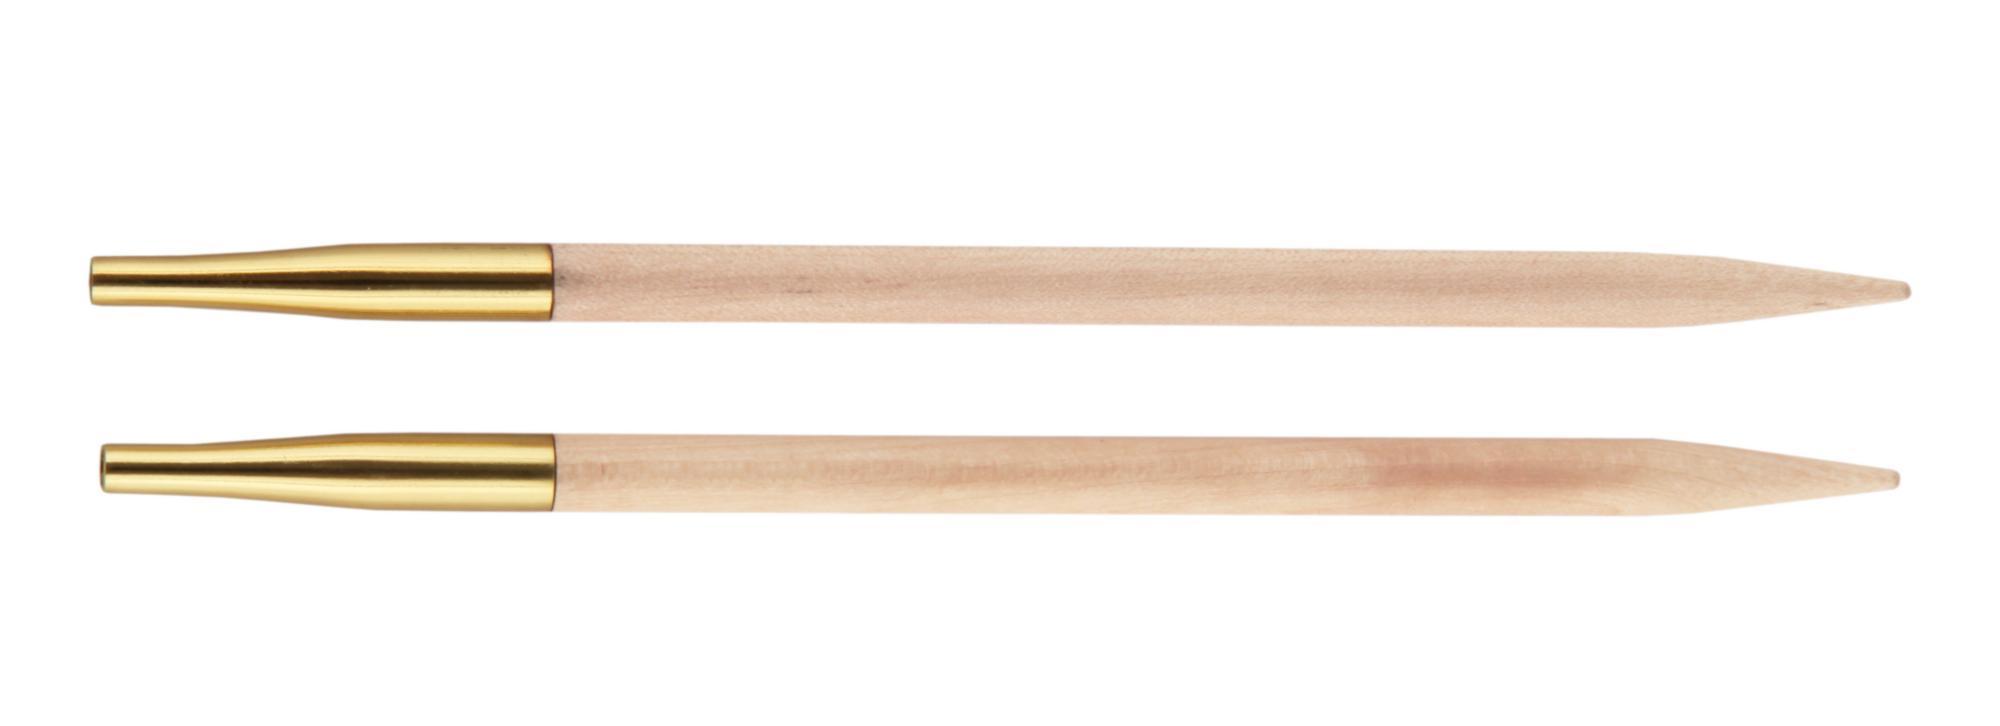 Спицы съемные Basix Birch Wood KnitPro, 35640, 6.50 мм